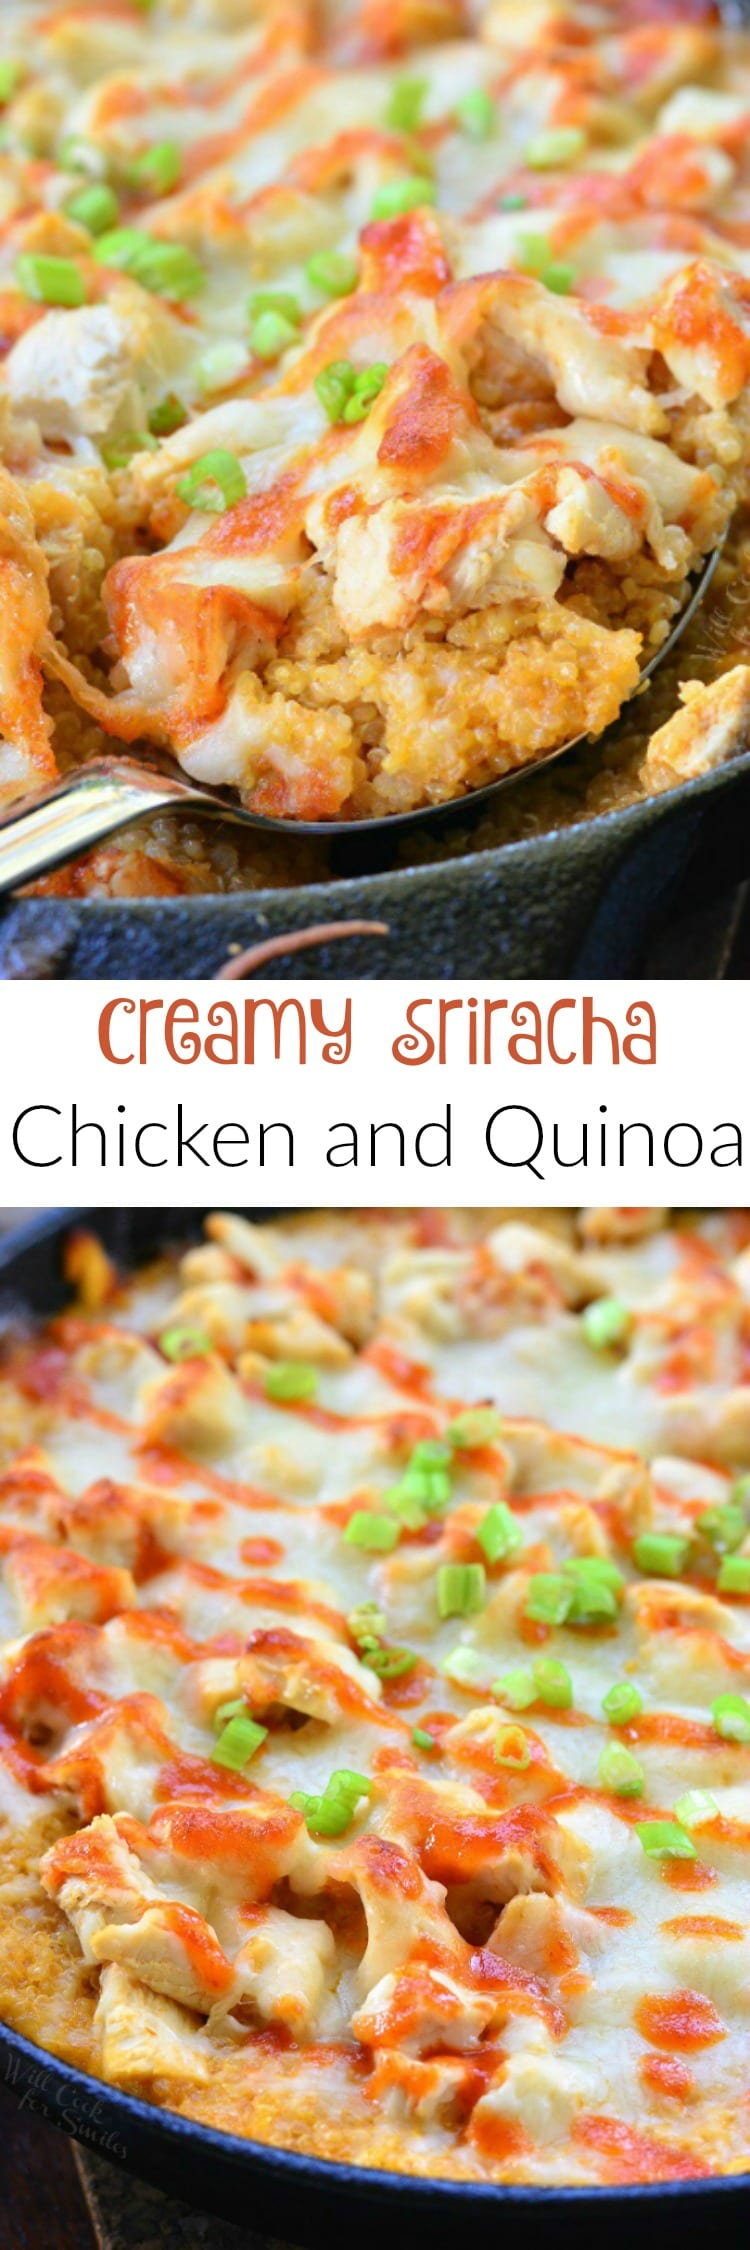 Creamy Sriracha Chicken and Quinoa Bake. Creamy, cheesy, and a bit spicy chicken and quinoa bake that will quickly become your favorite dinner.